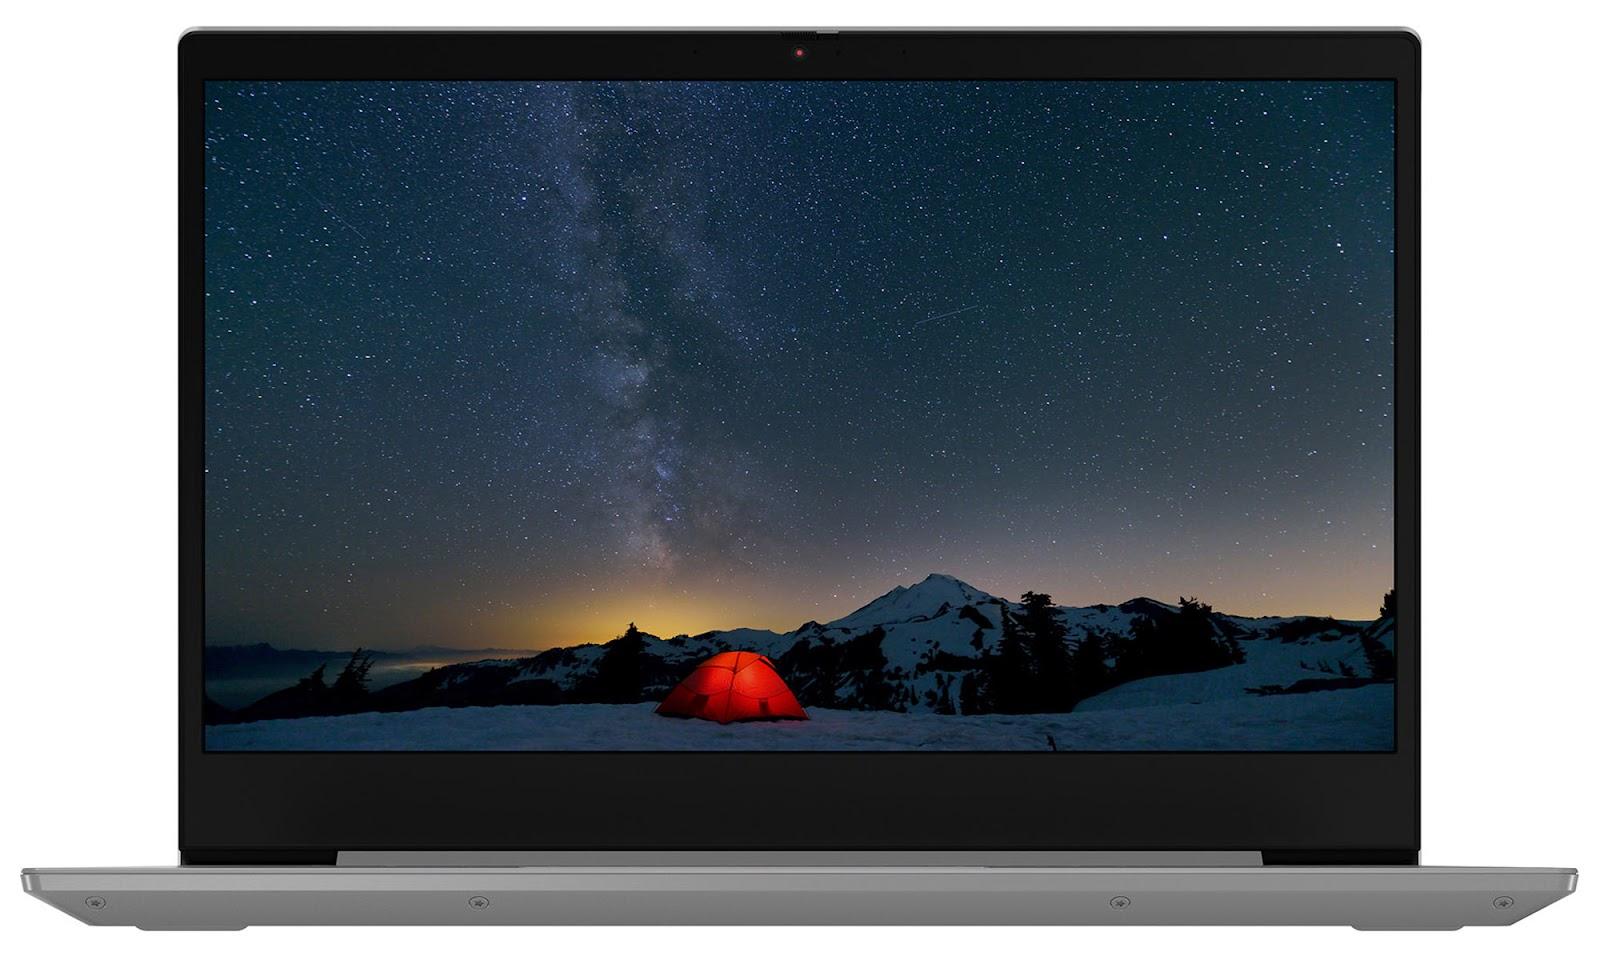 Фото 1. Ноутбук Lenovo ThinkBook 14 IIL (20SL00F5RU)